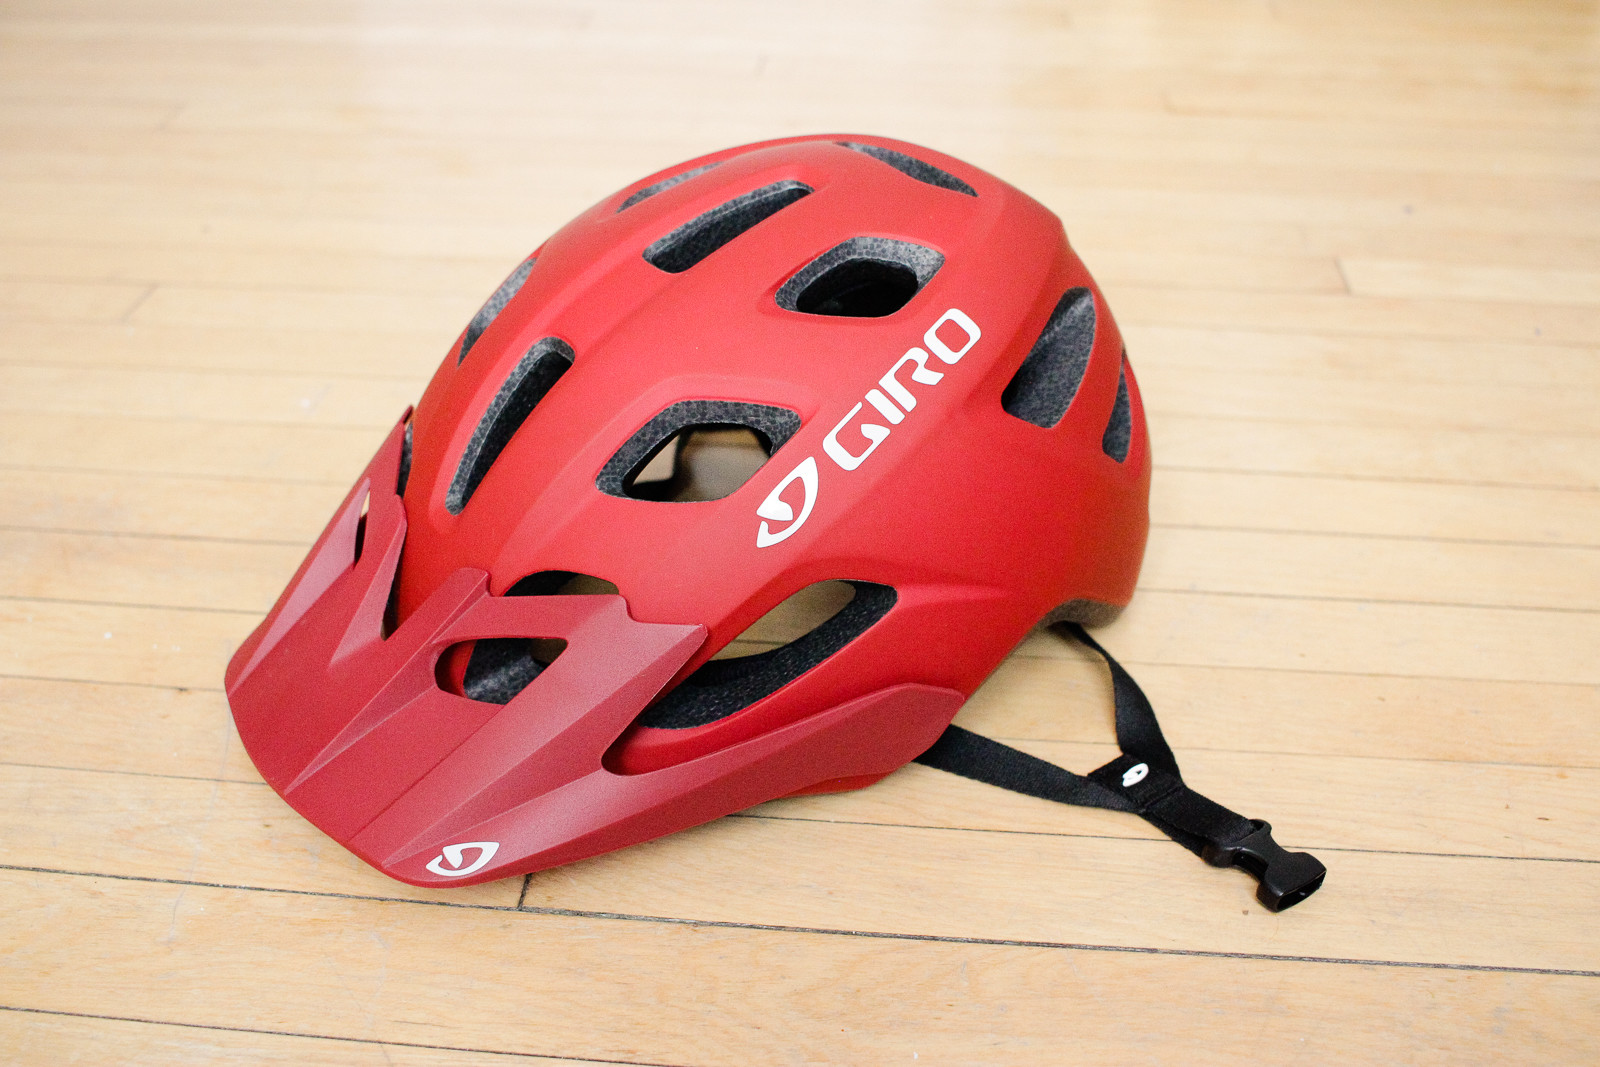 Giro Fixture : great helmet for all budgets